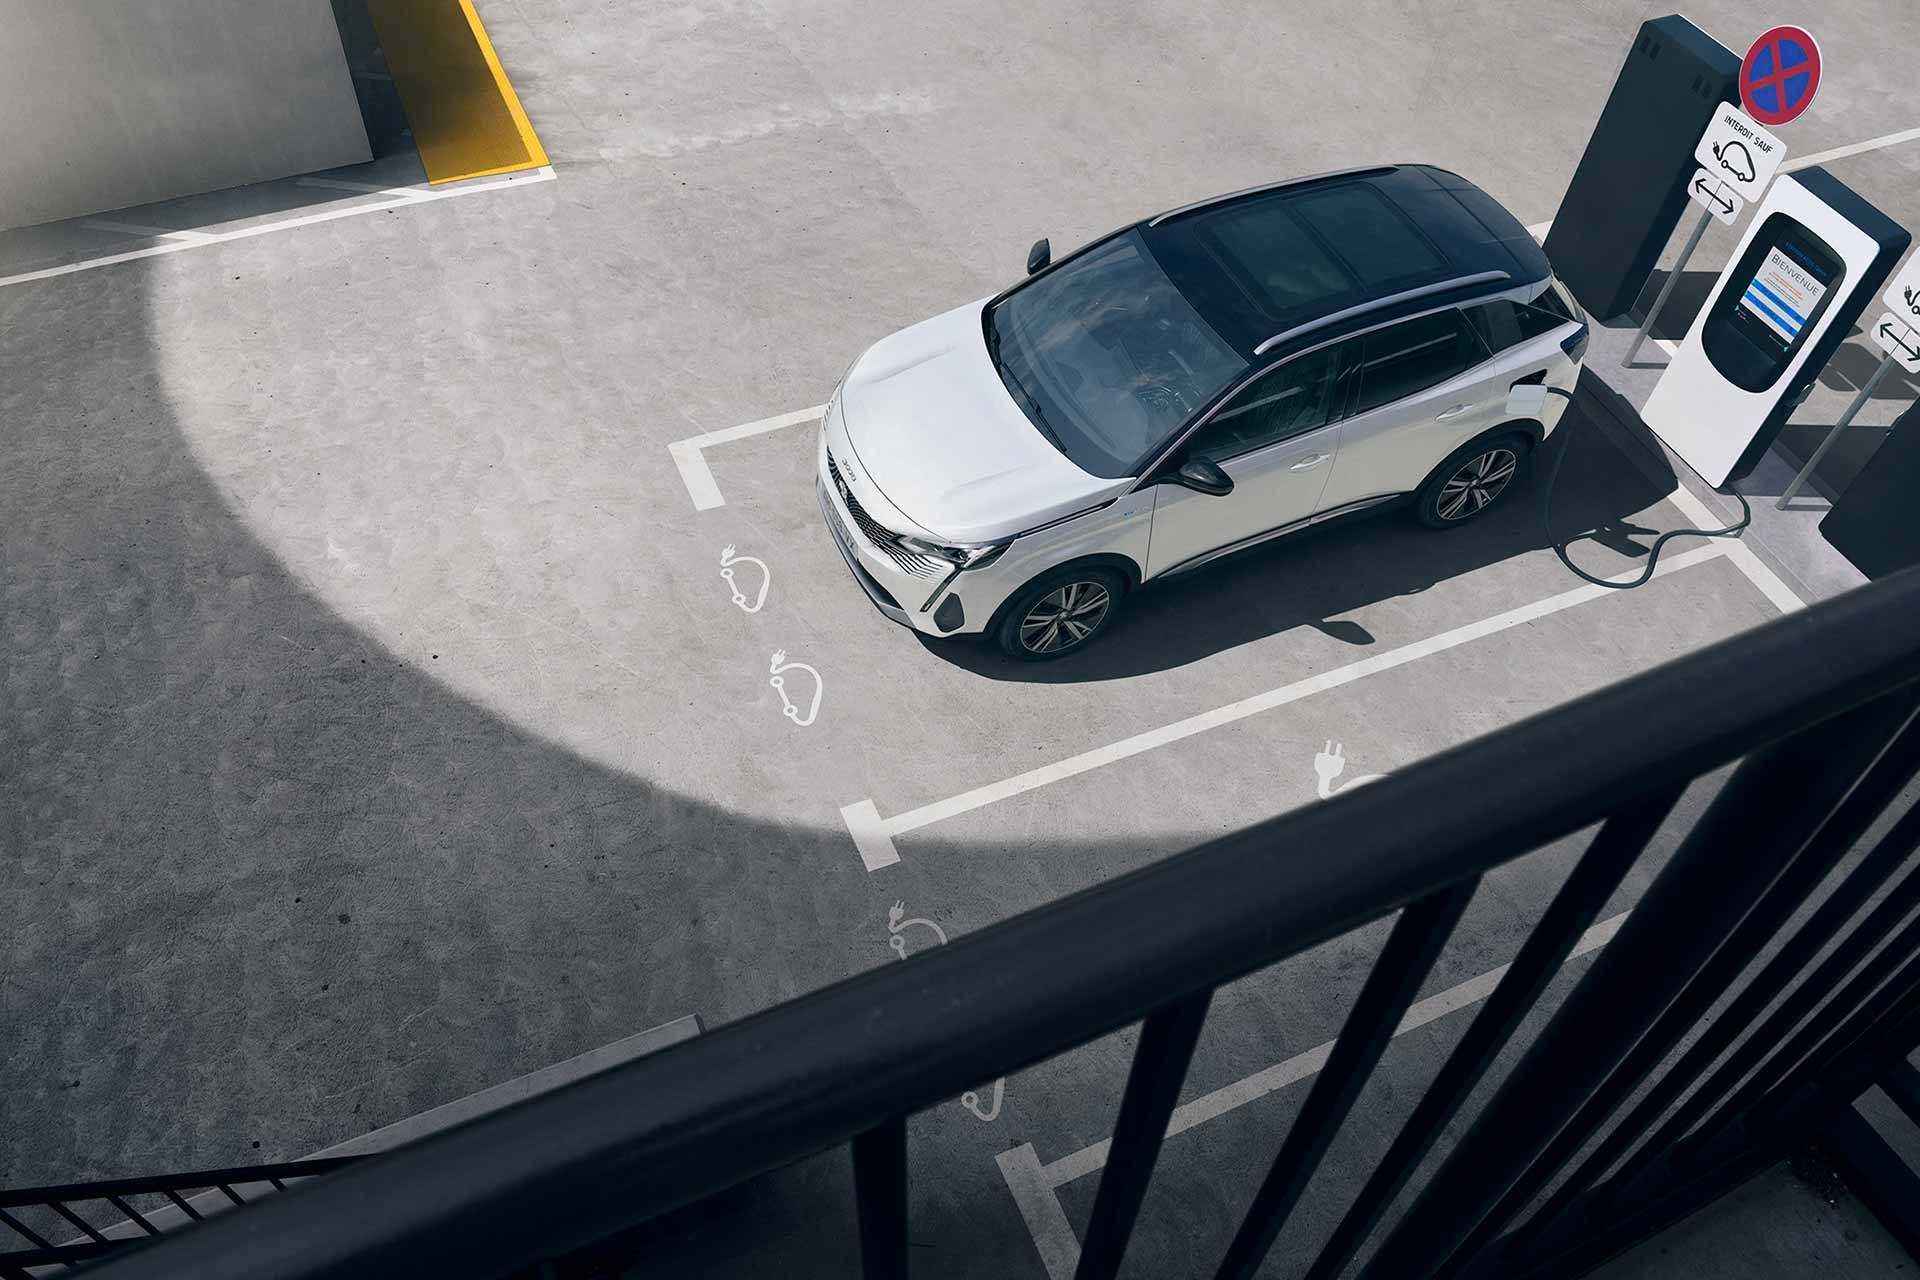 Peugeot 3008 SUV PHEV charging